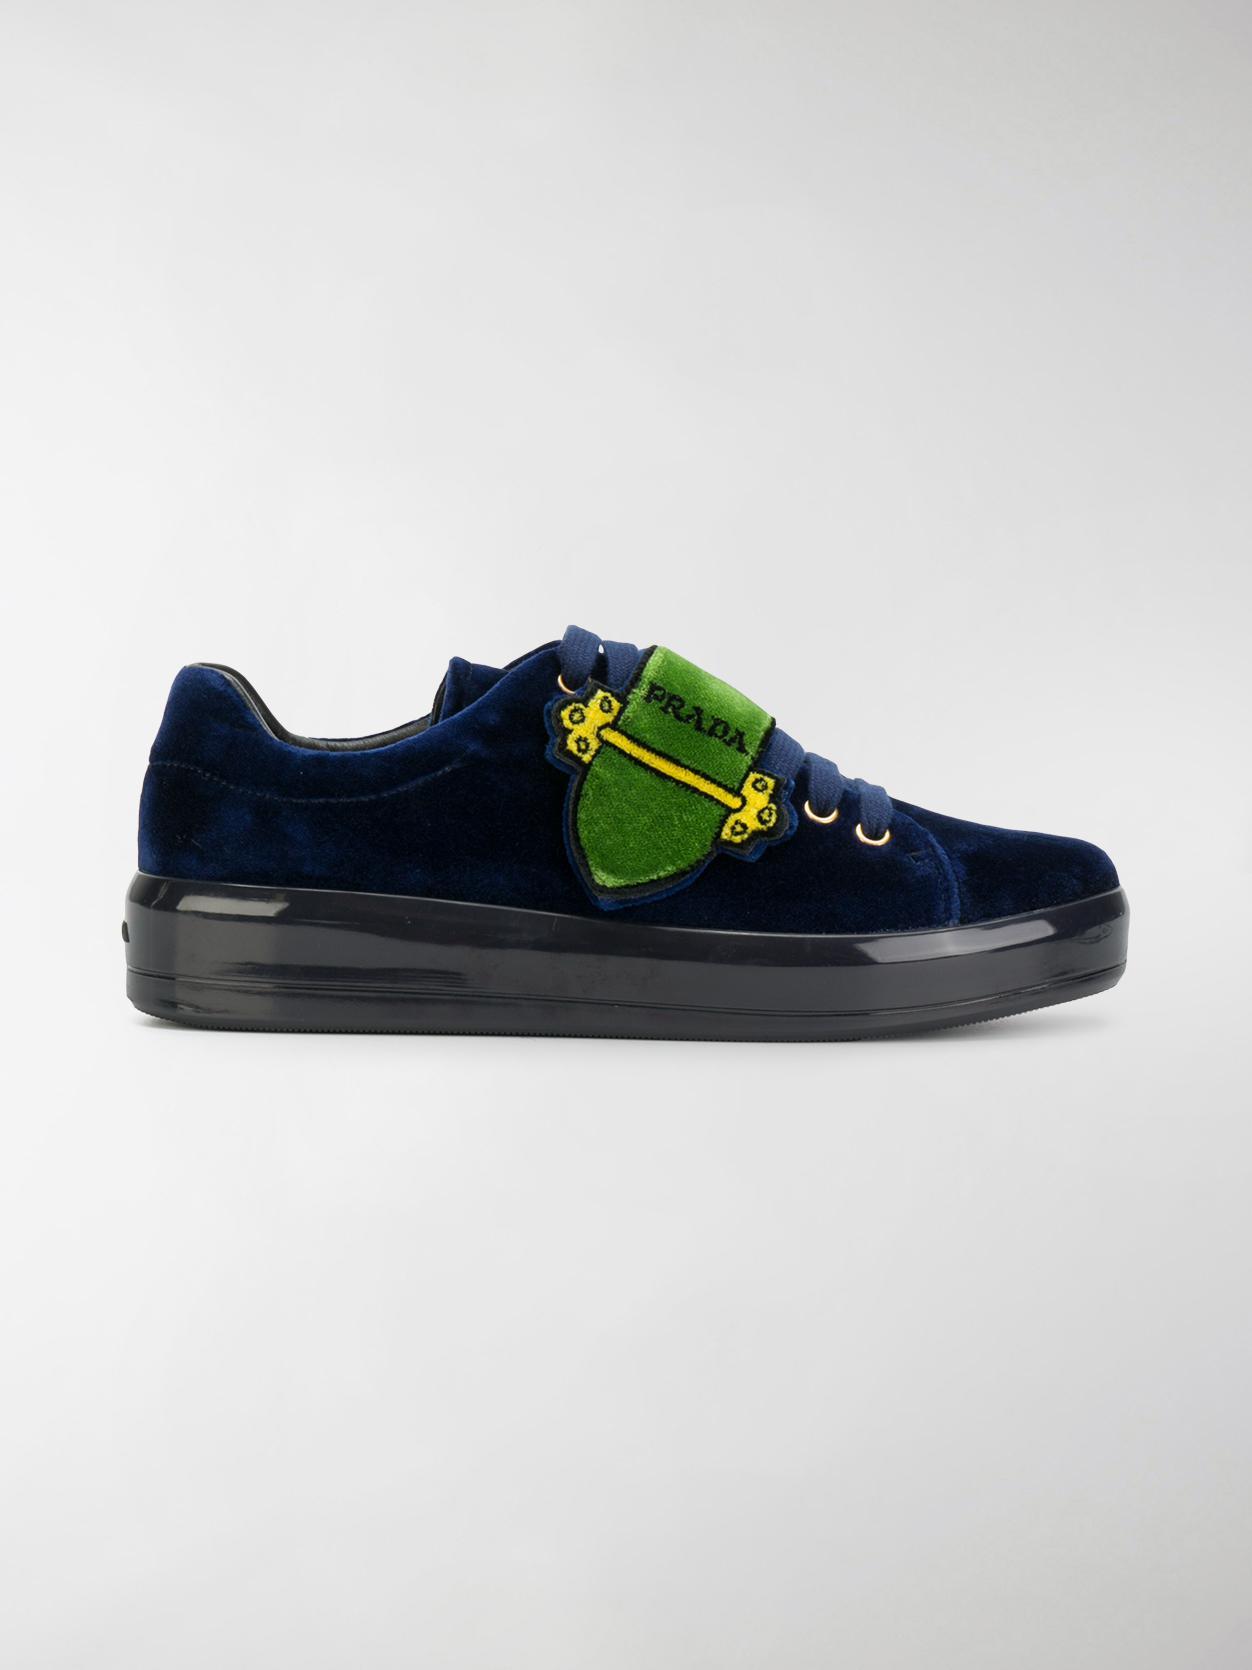 e5fc42d8d36 coupon lyst prada trompe loeil strap velvet sneakers in blue for men 0b524  51c1d